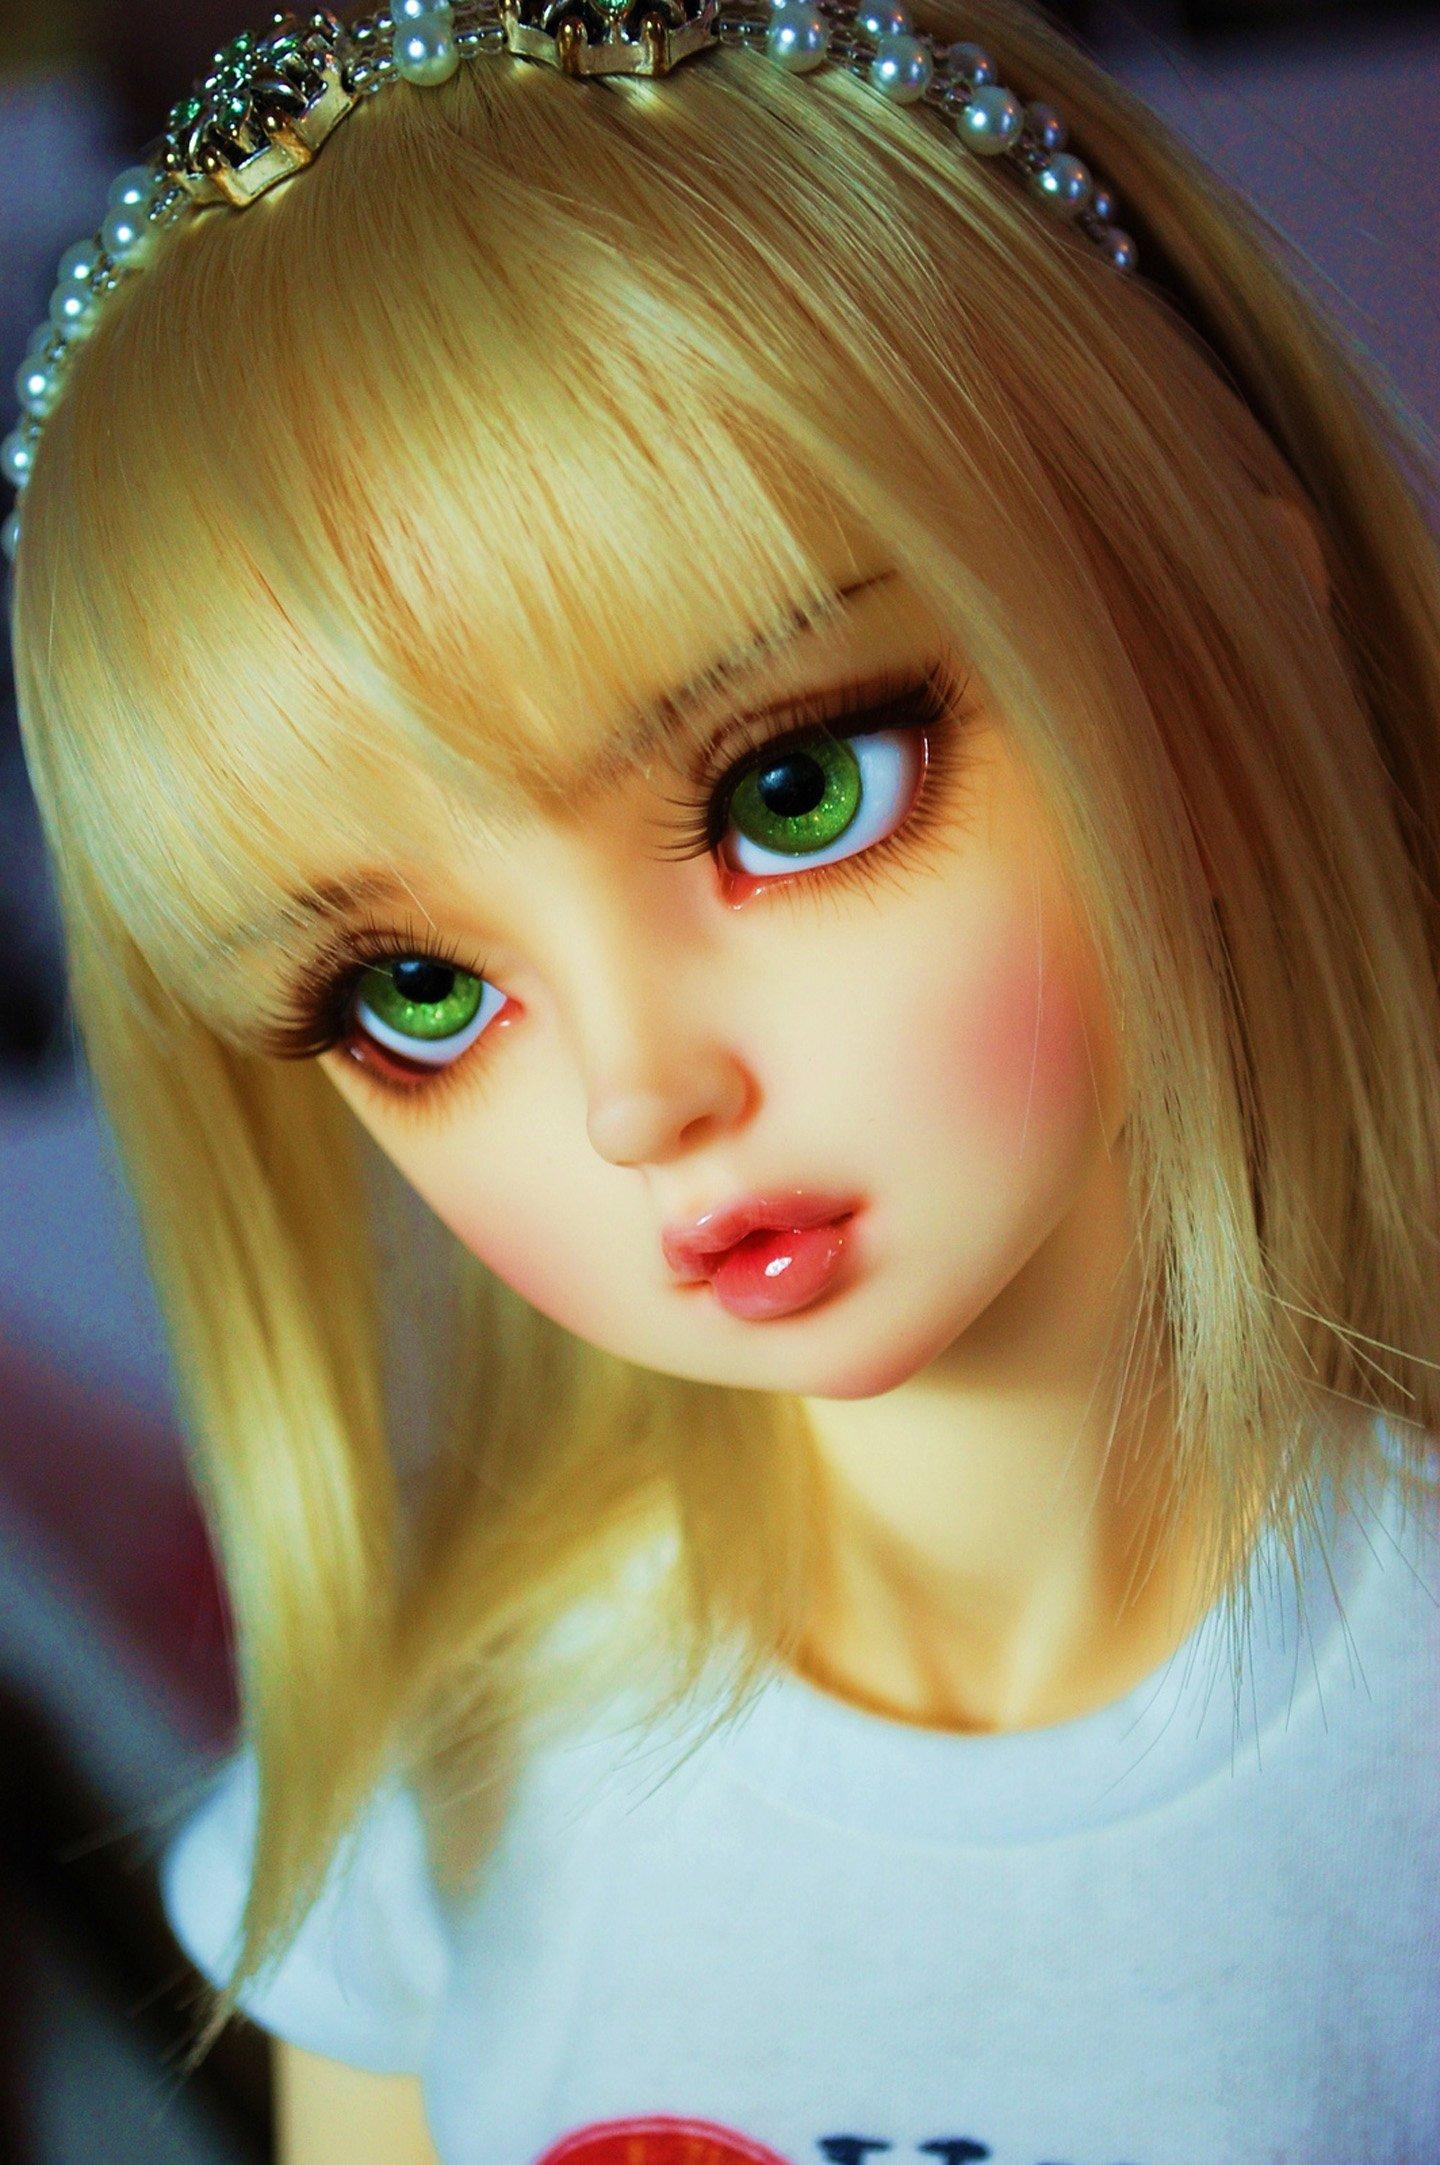 Doll Blonde Green Eyes Toys Beautiful Wallpaper  1440X2165  442991  Wallpaperup-7586